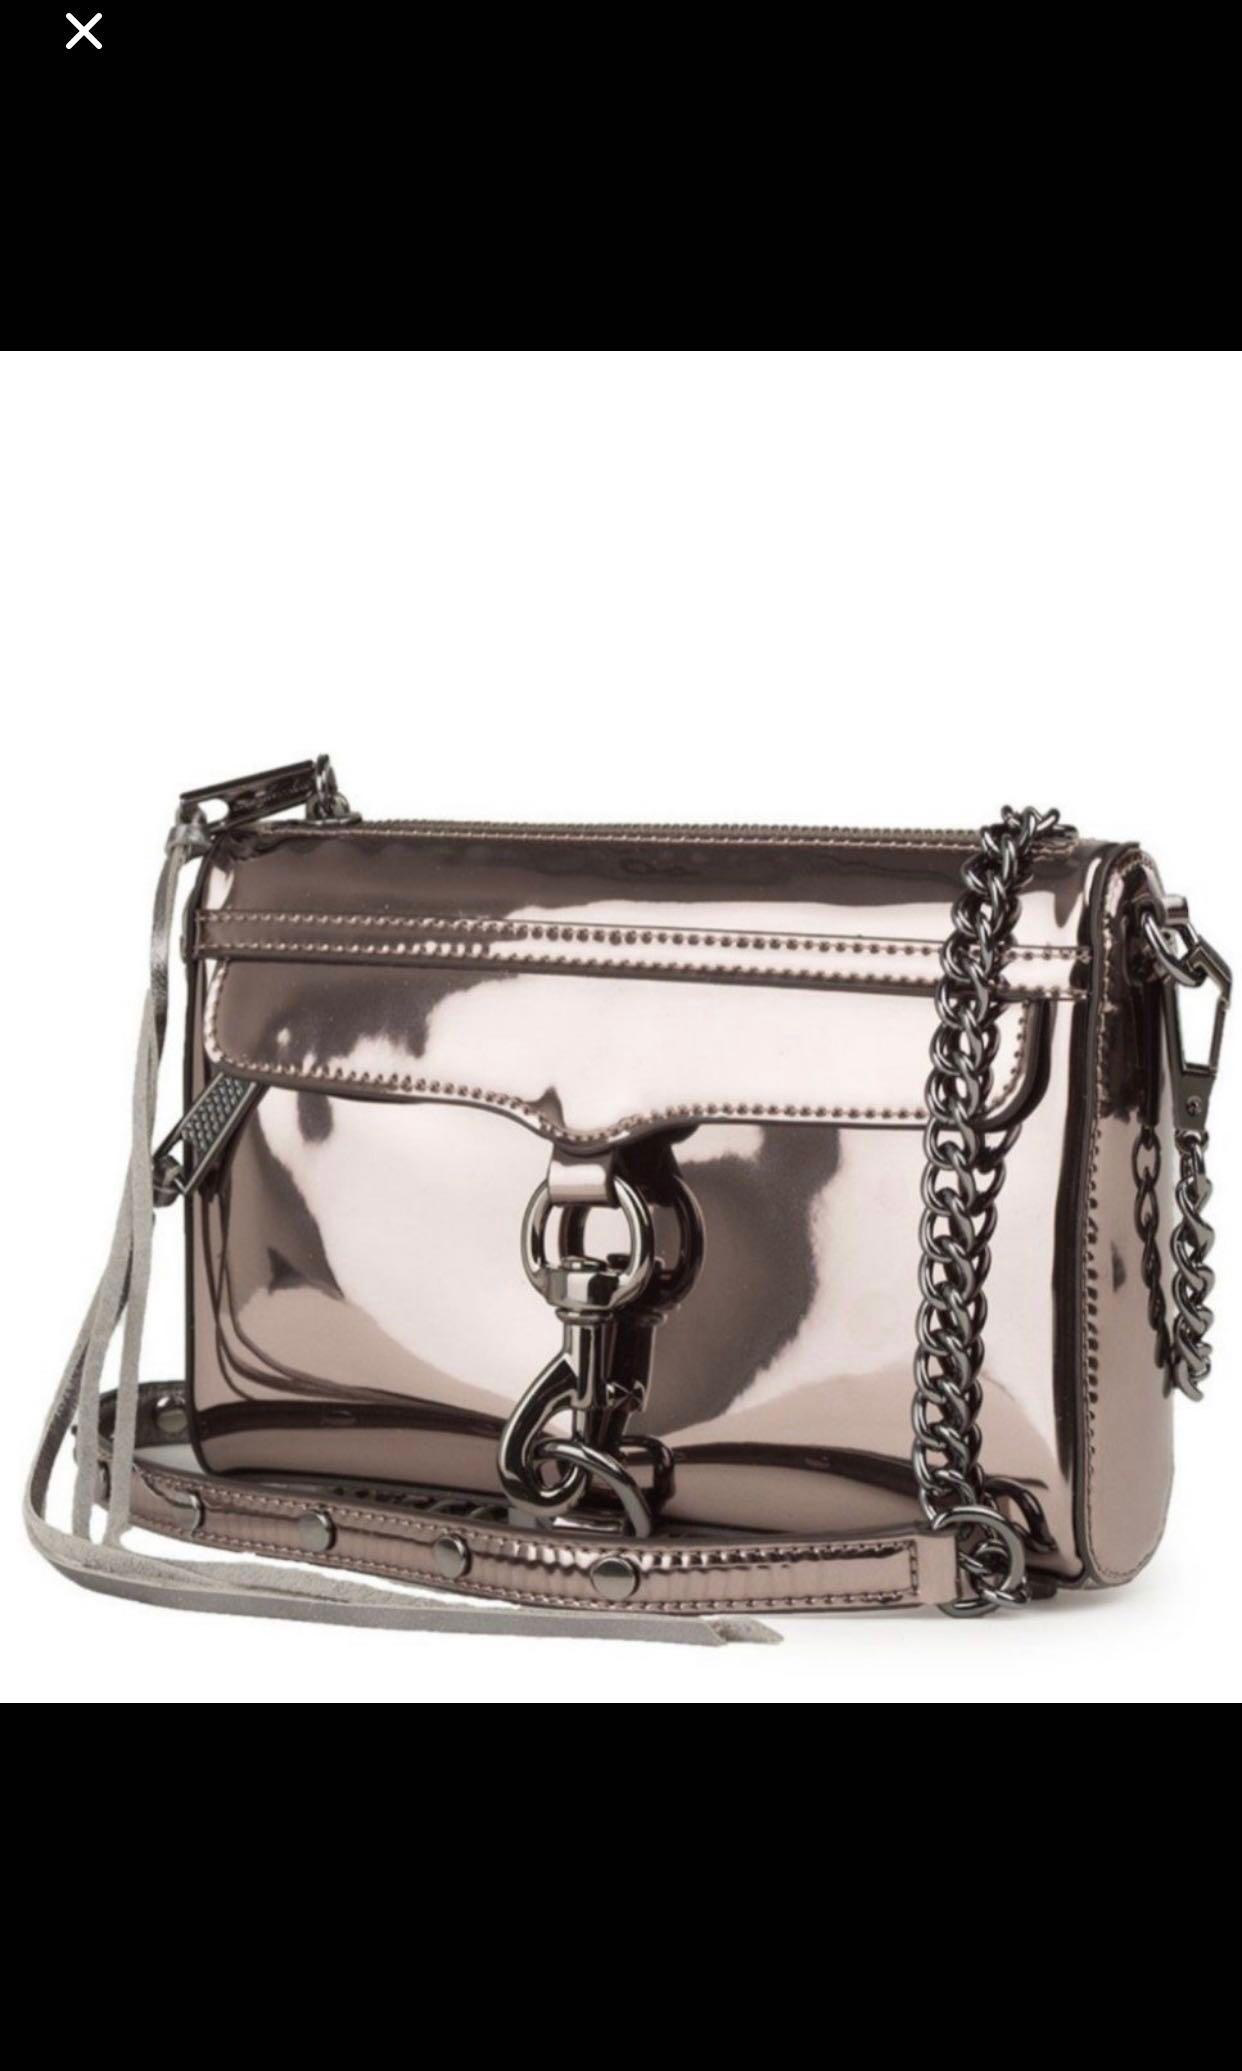 d5a916378 Rebecca minkoff metallic sling bag